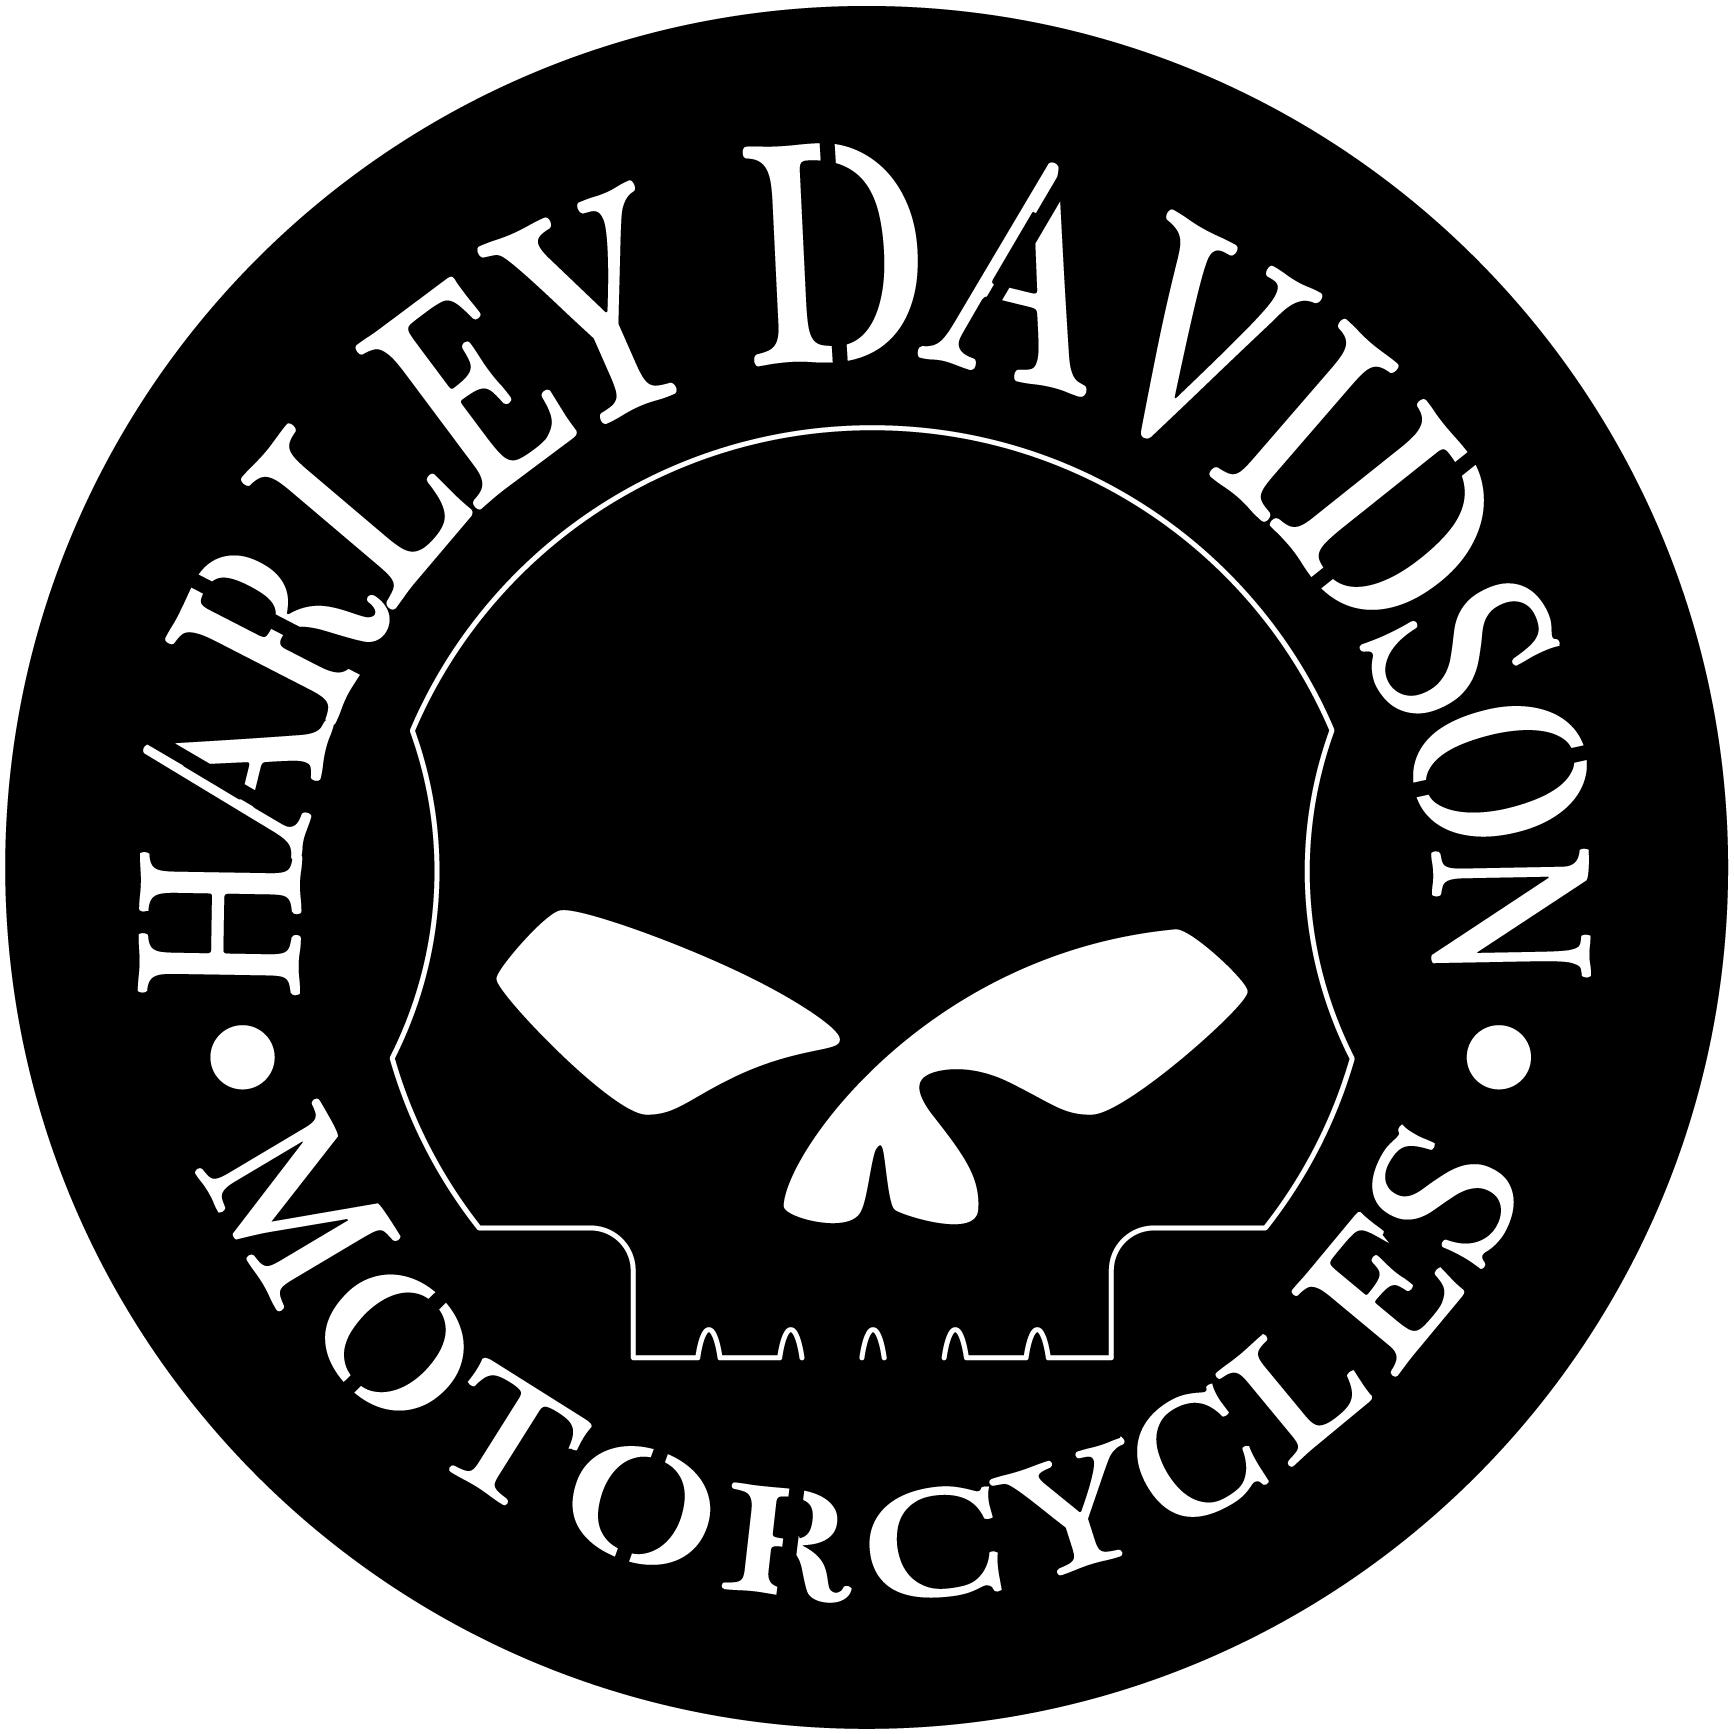 Harley Davidson Motorcycles Skull DXF file | Cnc clip art ...